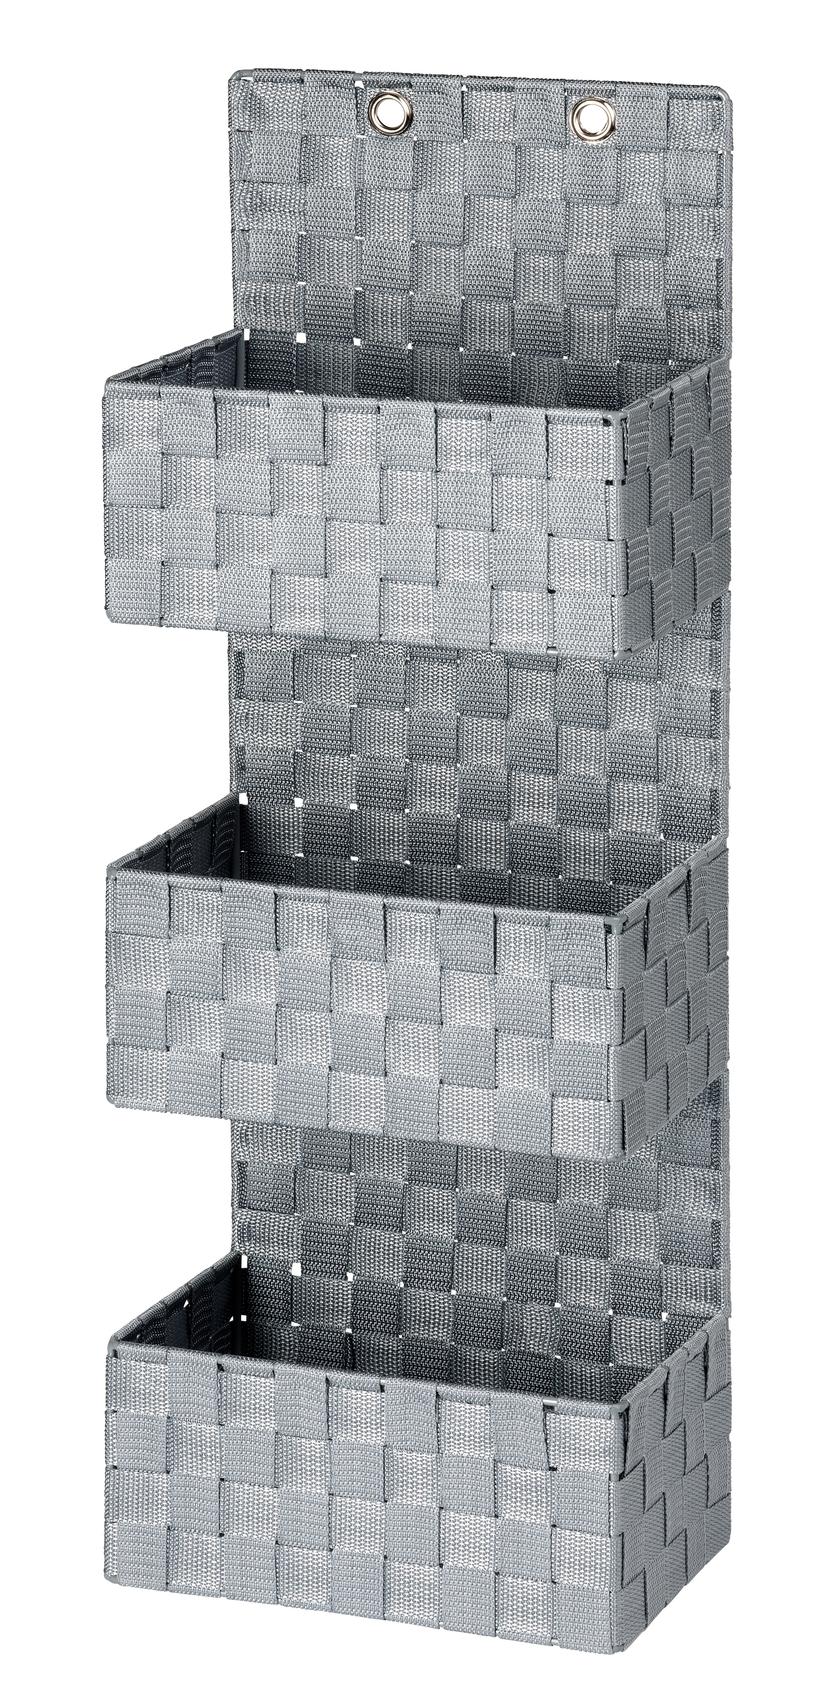 Organizator suspendat din polipropilena, cu 3 compartimente, Adria Gri, l25xA15,5xH72 cm imagine